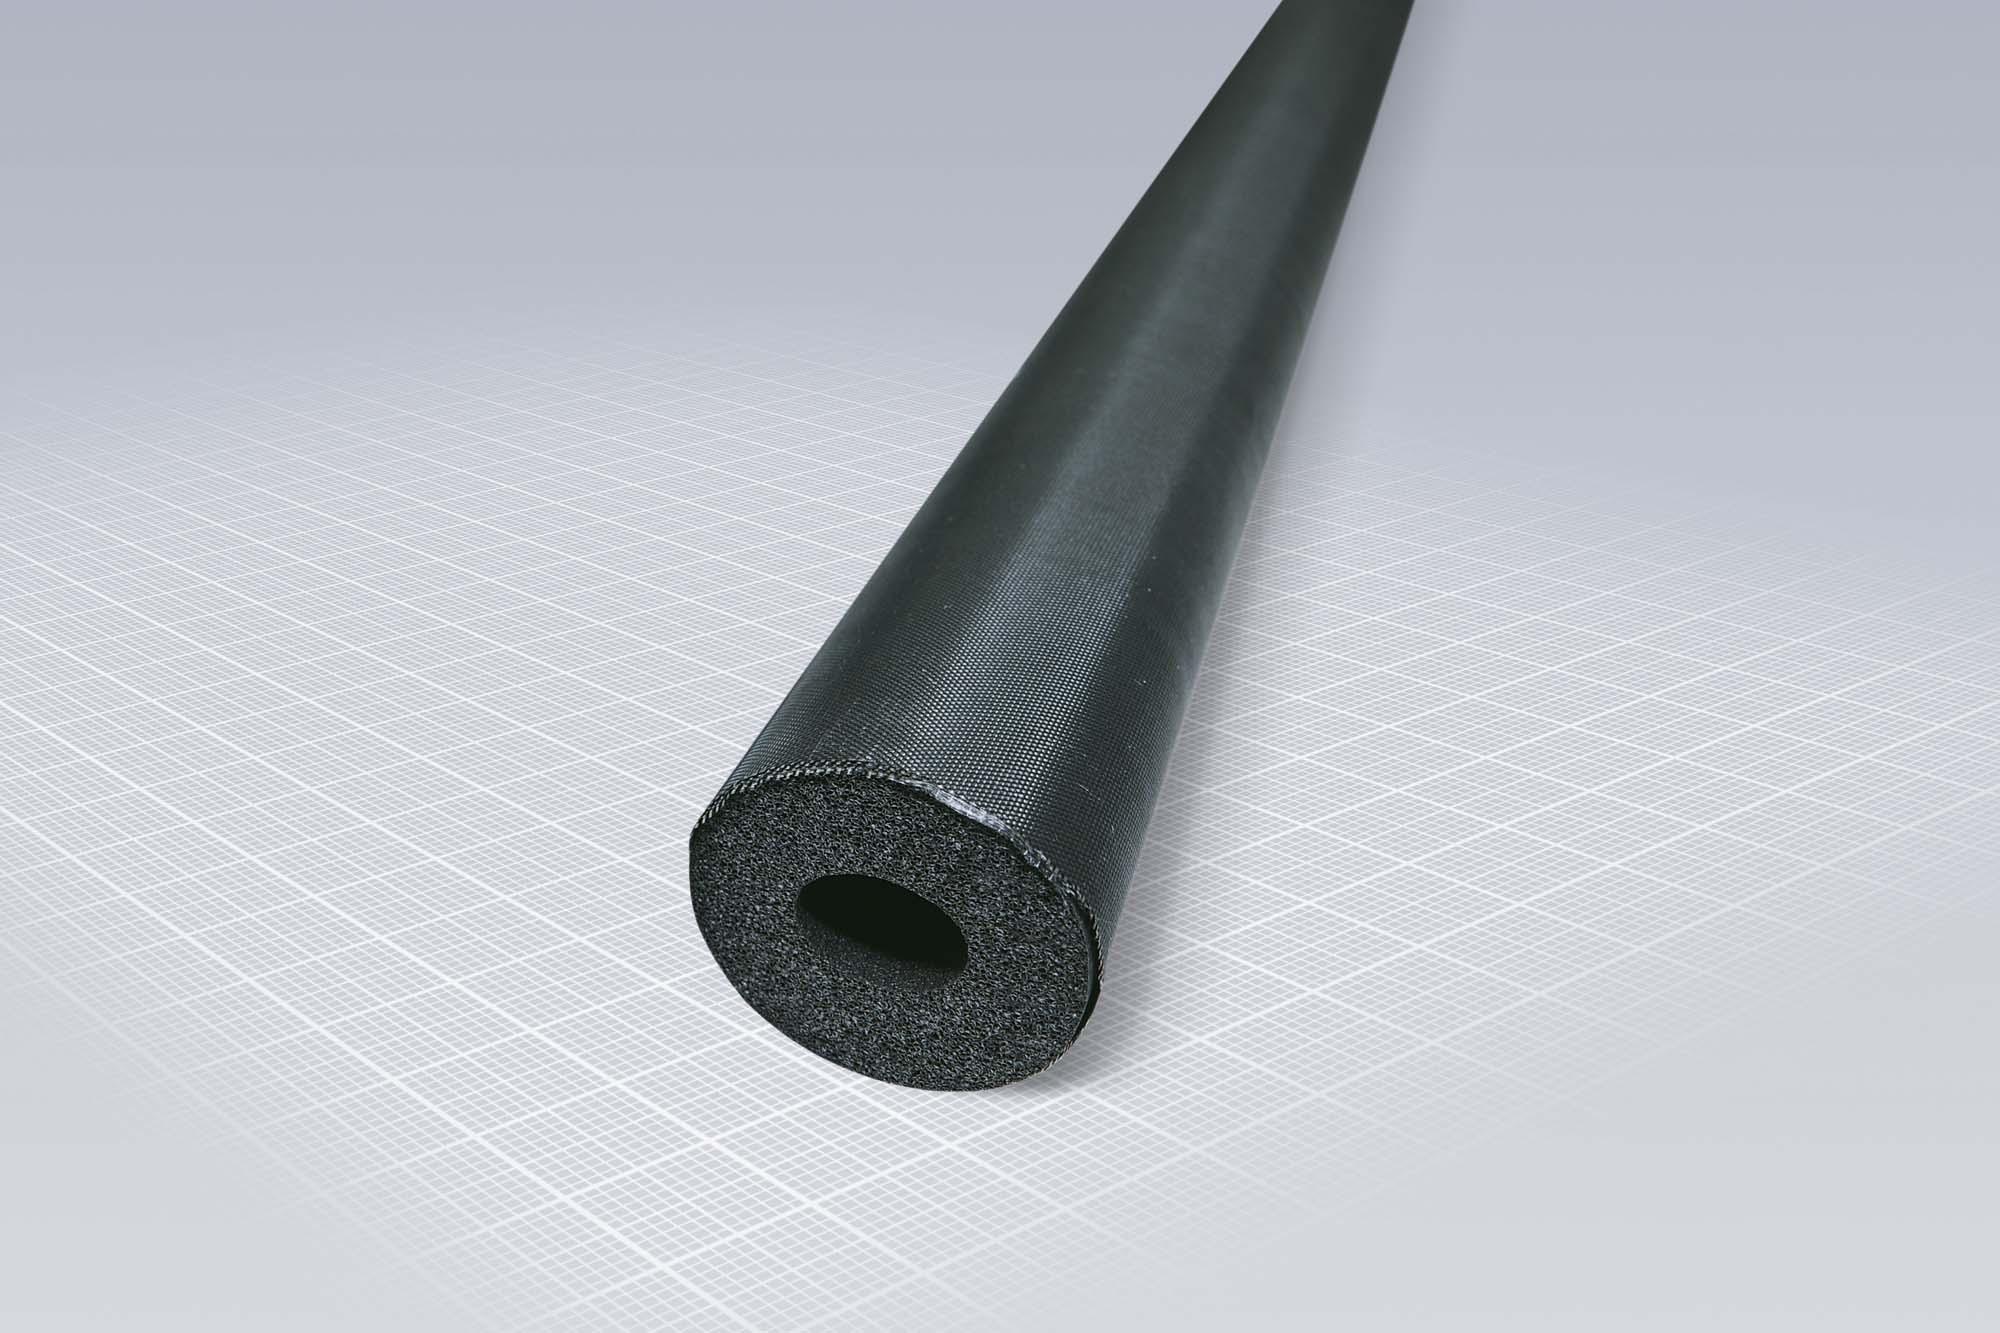 Izolatie tub pentru aplicatii industriale Armacell Arma-Chek D  ARMACELL - Poza 23